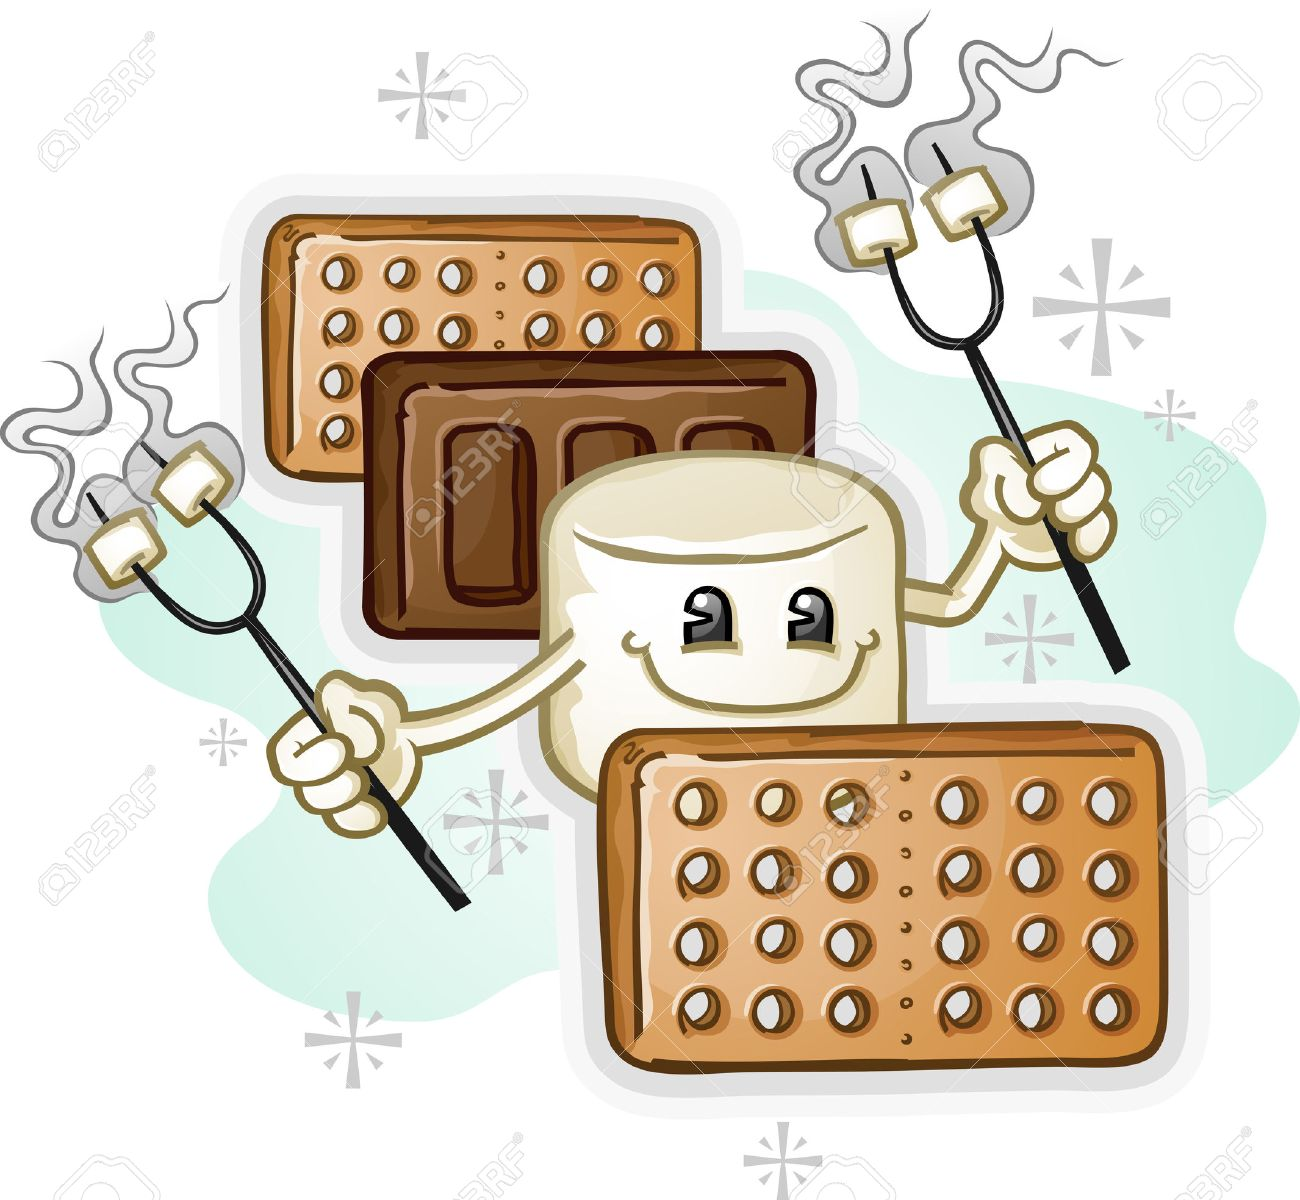 Marshmallow Smores Cartoon Character holding Roasting Sticks Stock Vector - 26740411